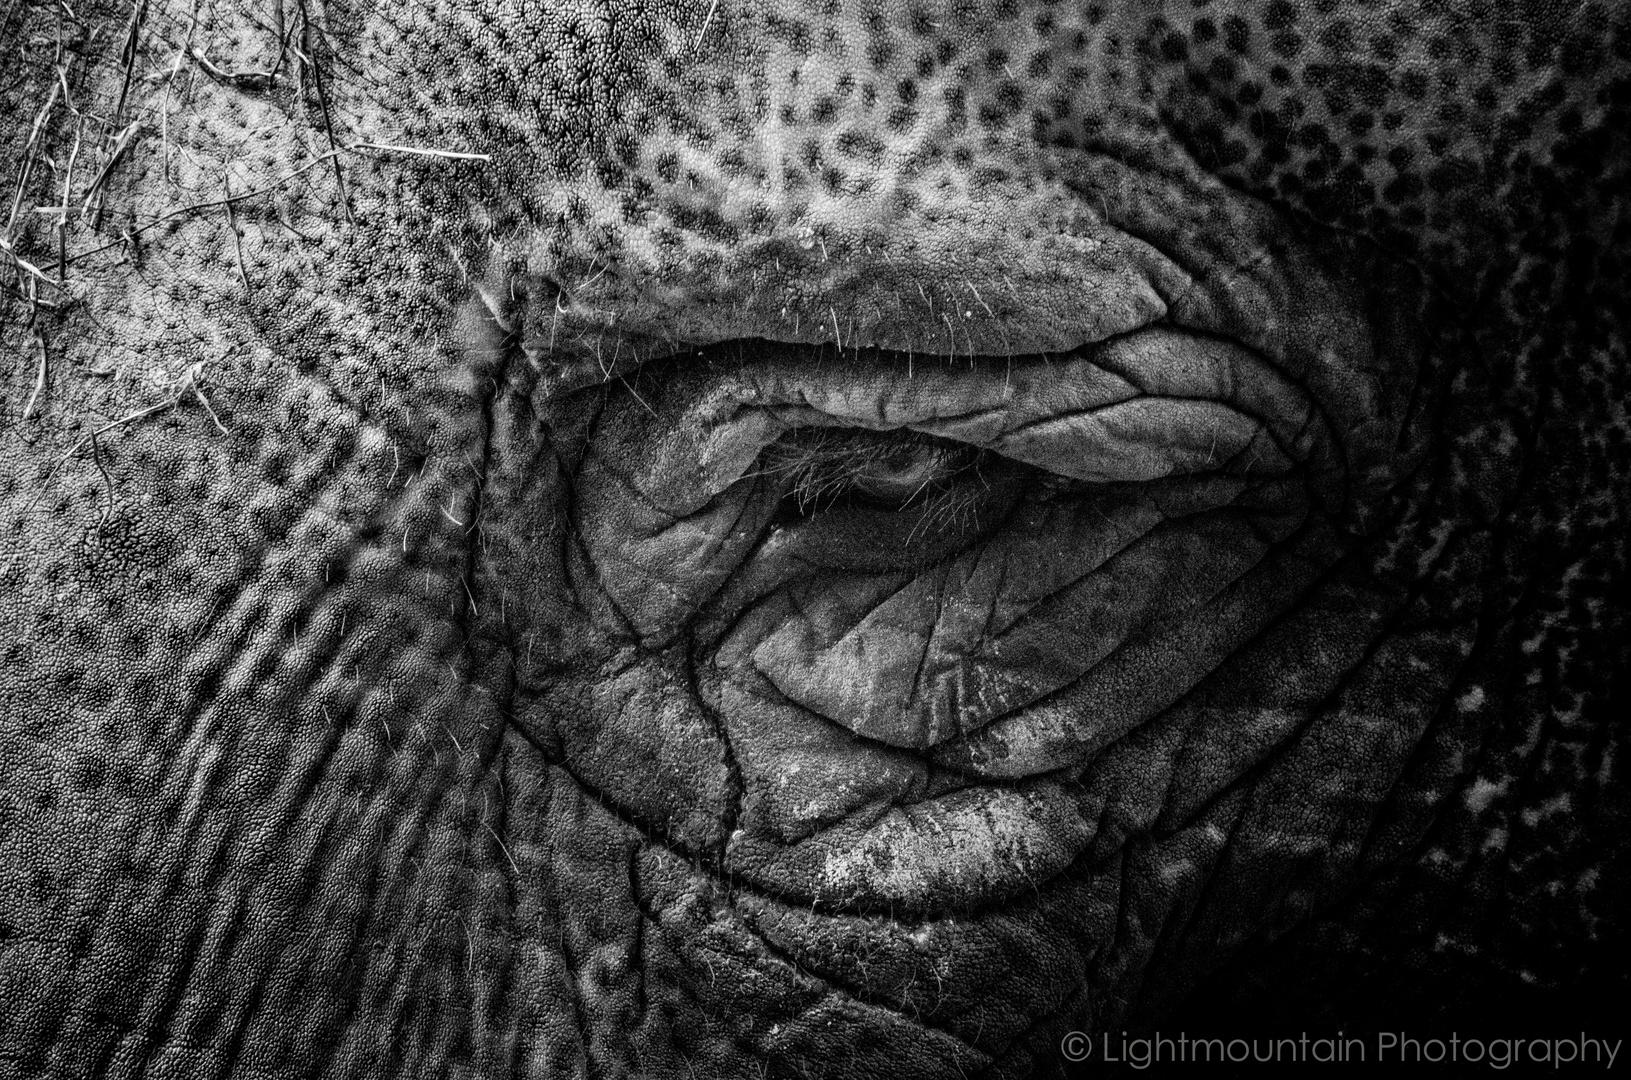 Elefantenaugen